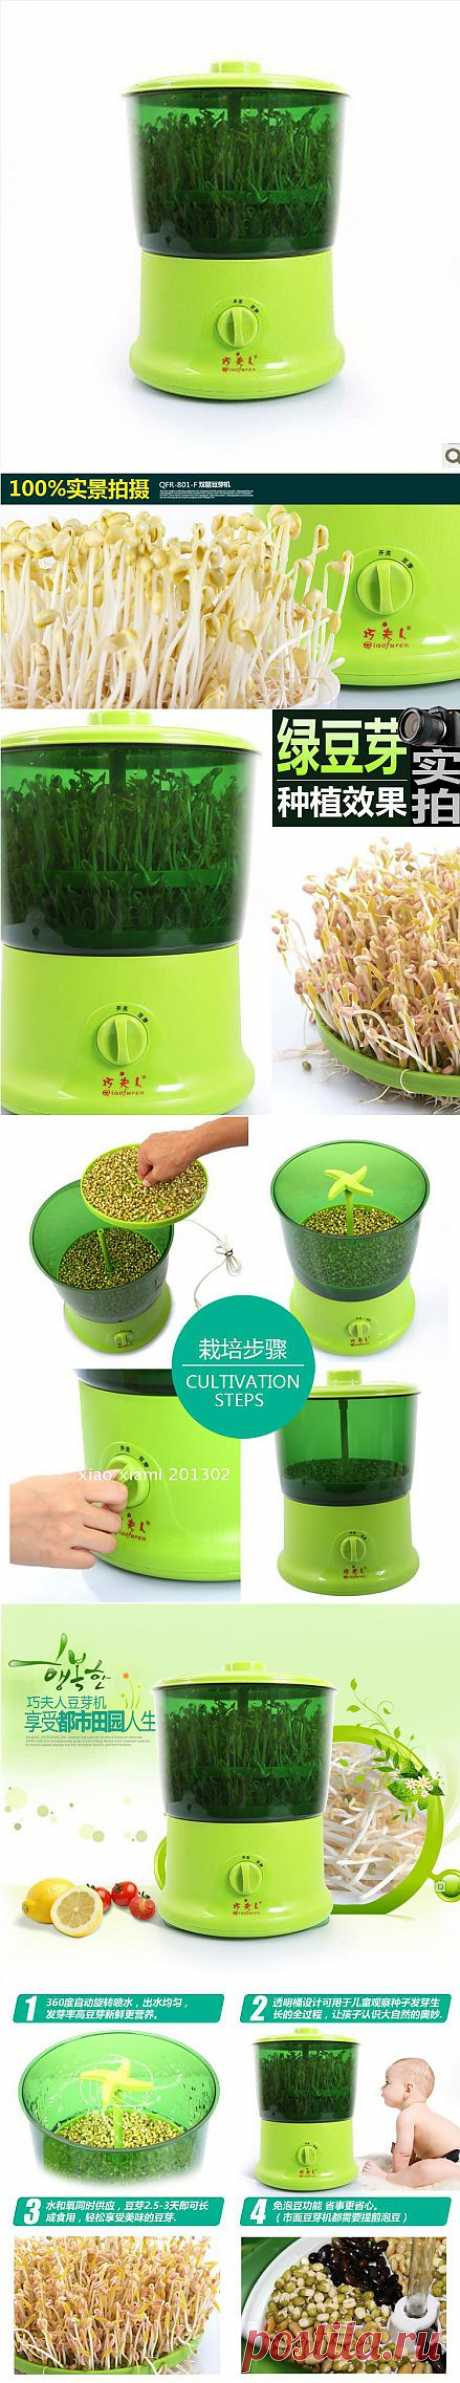 Машинка для проращивания зерен на Таобао